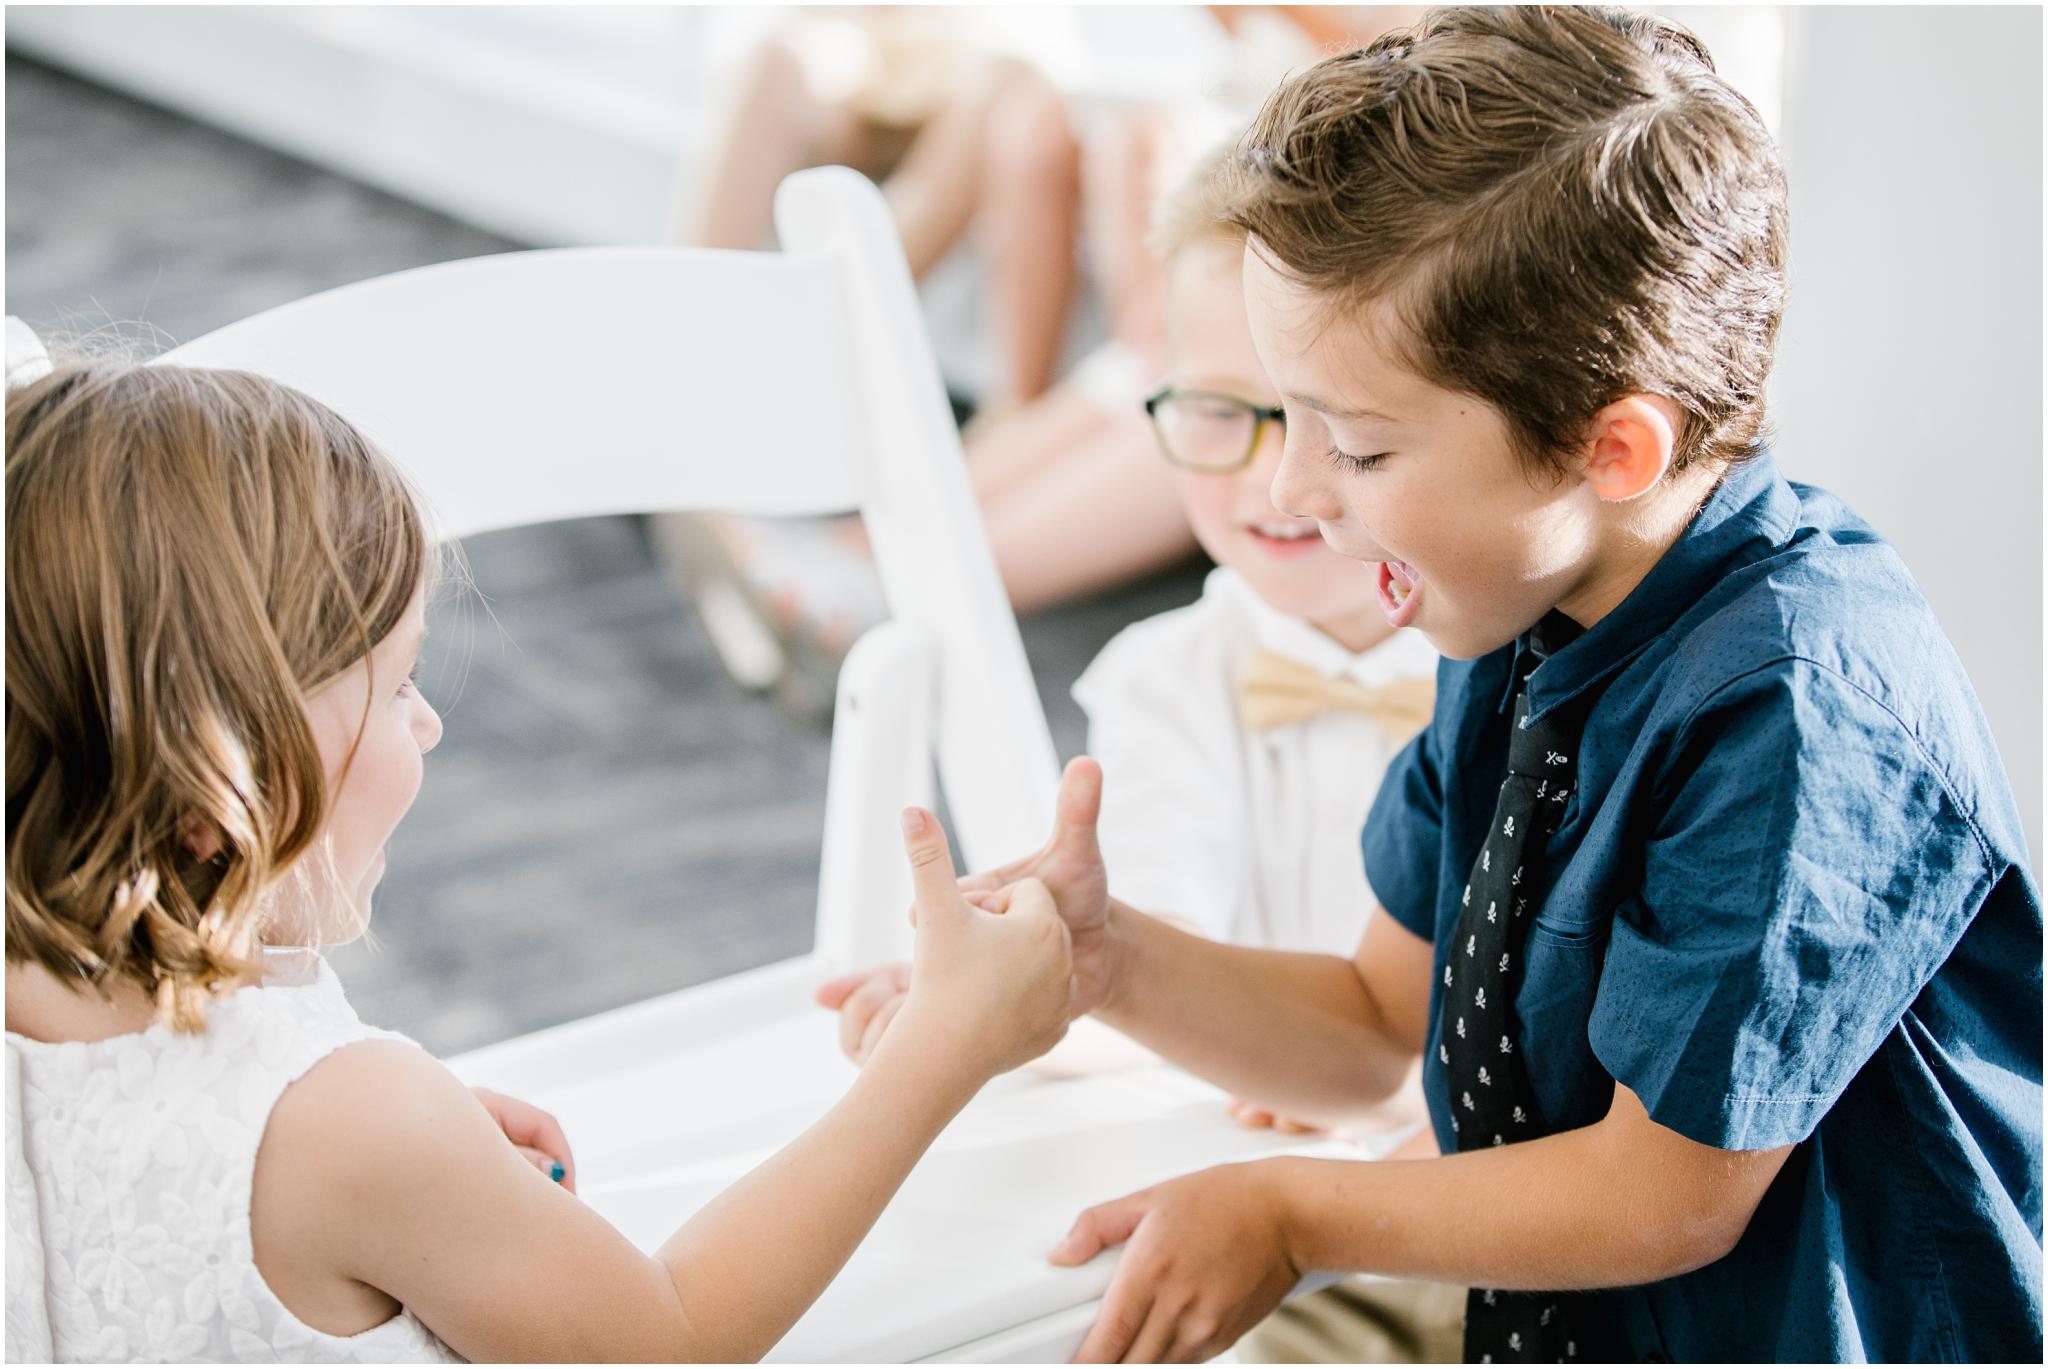 CherylandTyler-485_Lizzie-B-Imagery-Utah-Wedding-Photographer-Salt-Lake-City-Temple-Wells-Fargo-Building-Reception.jpg